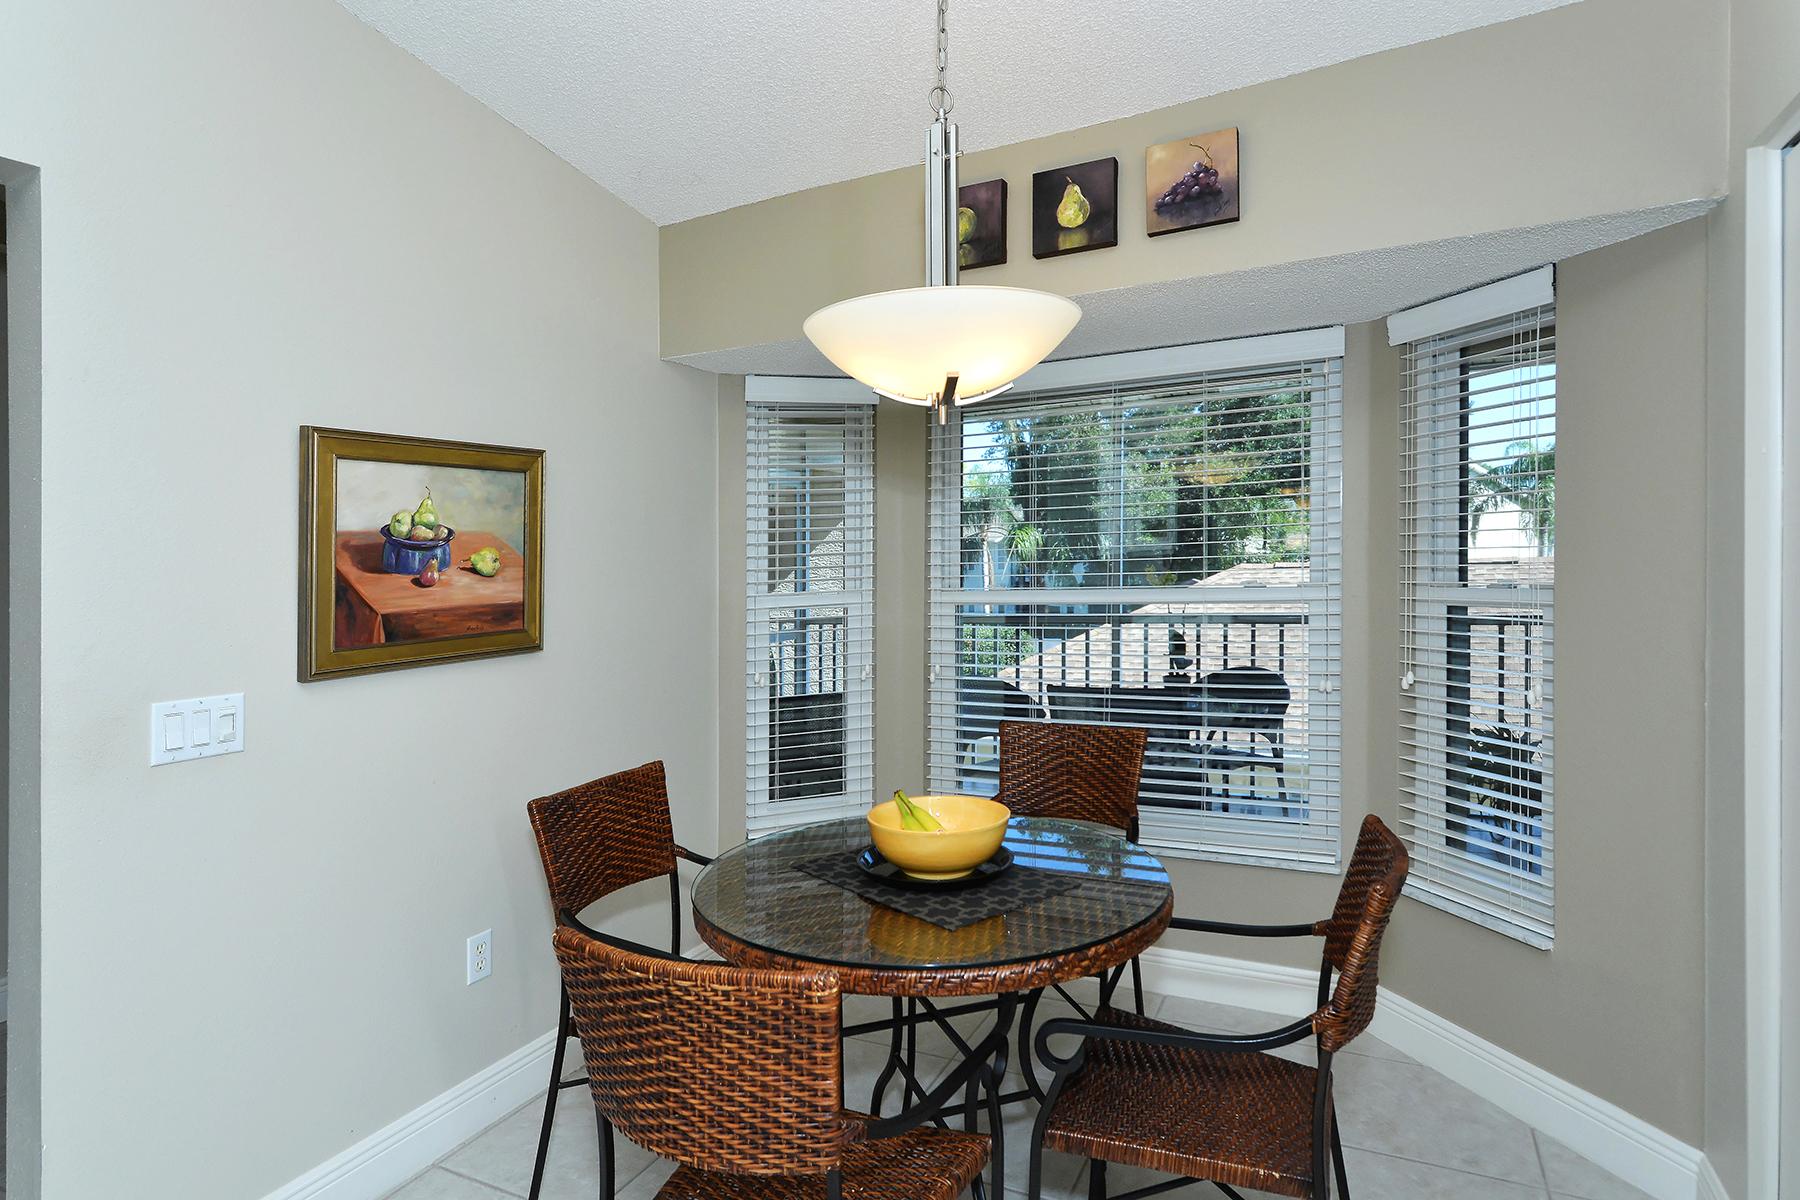 Additional photo for property listing at SARASOTA 9470  High Gate Dr 2228,  Sarasota, Florida 34238 United States